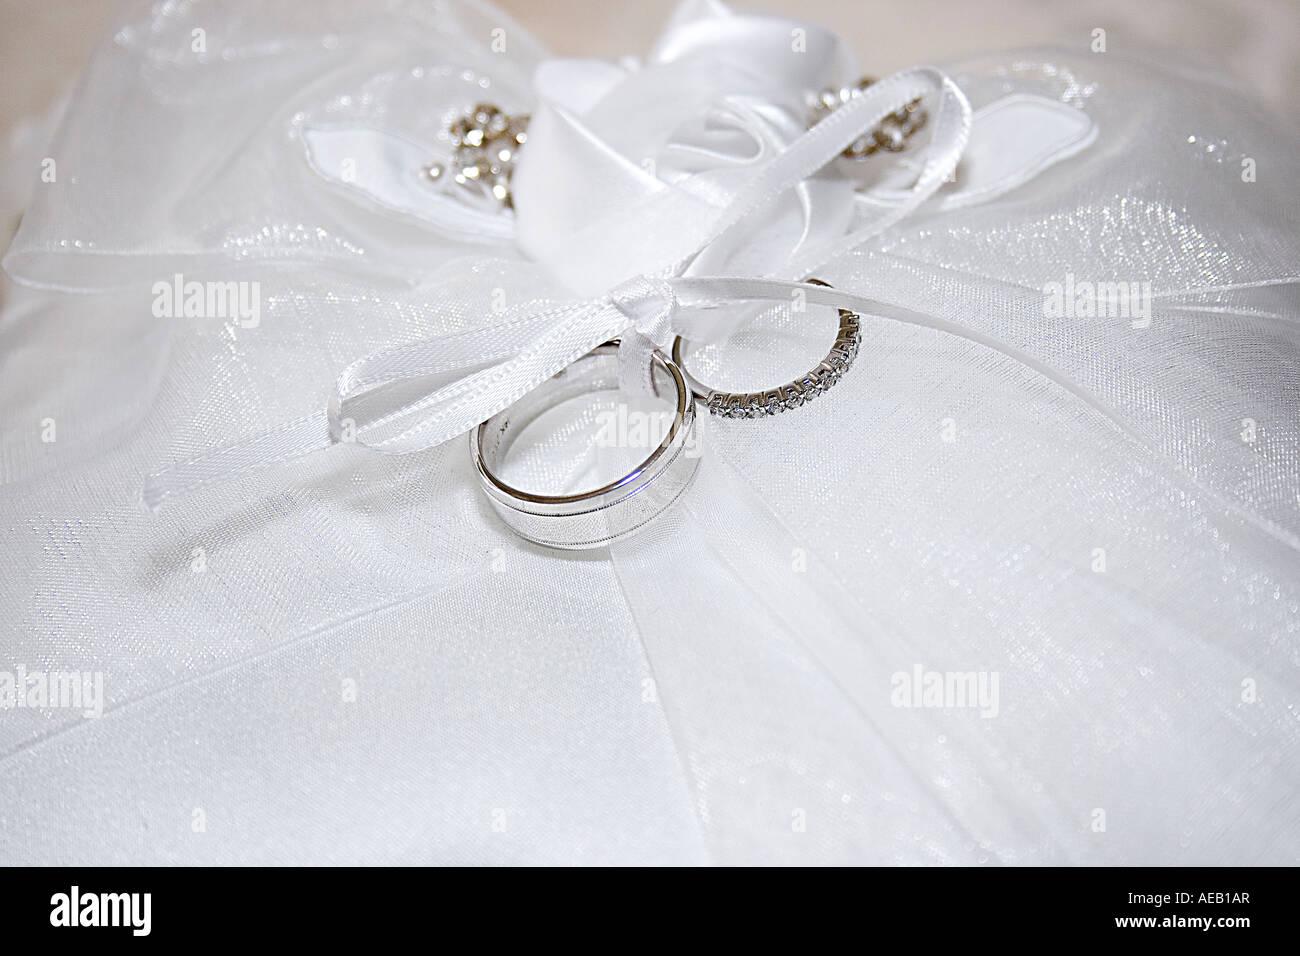 Kissen Hochzeit Ringe Band Spitzen Stockfoto Bild 13626382 Alamy